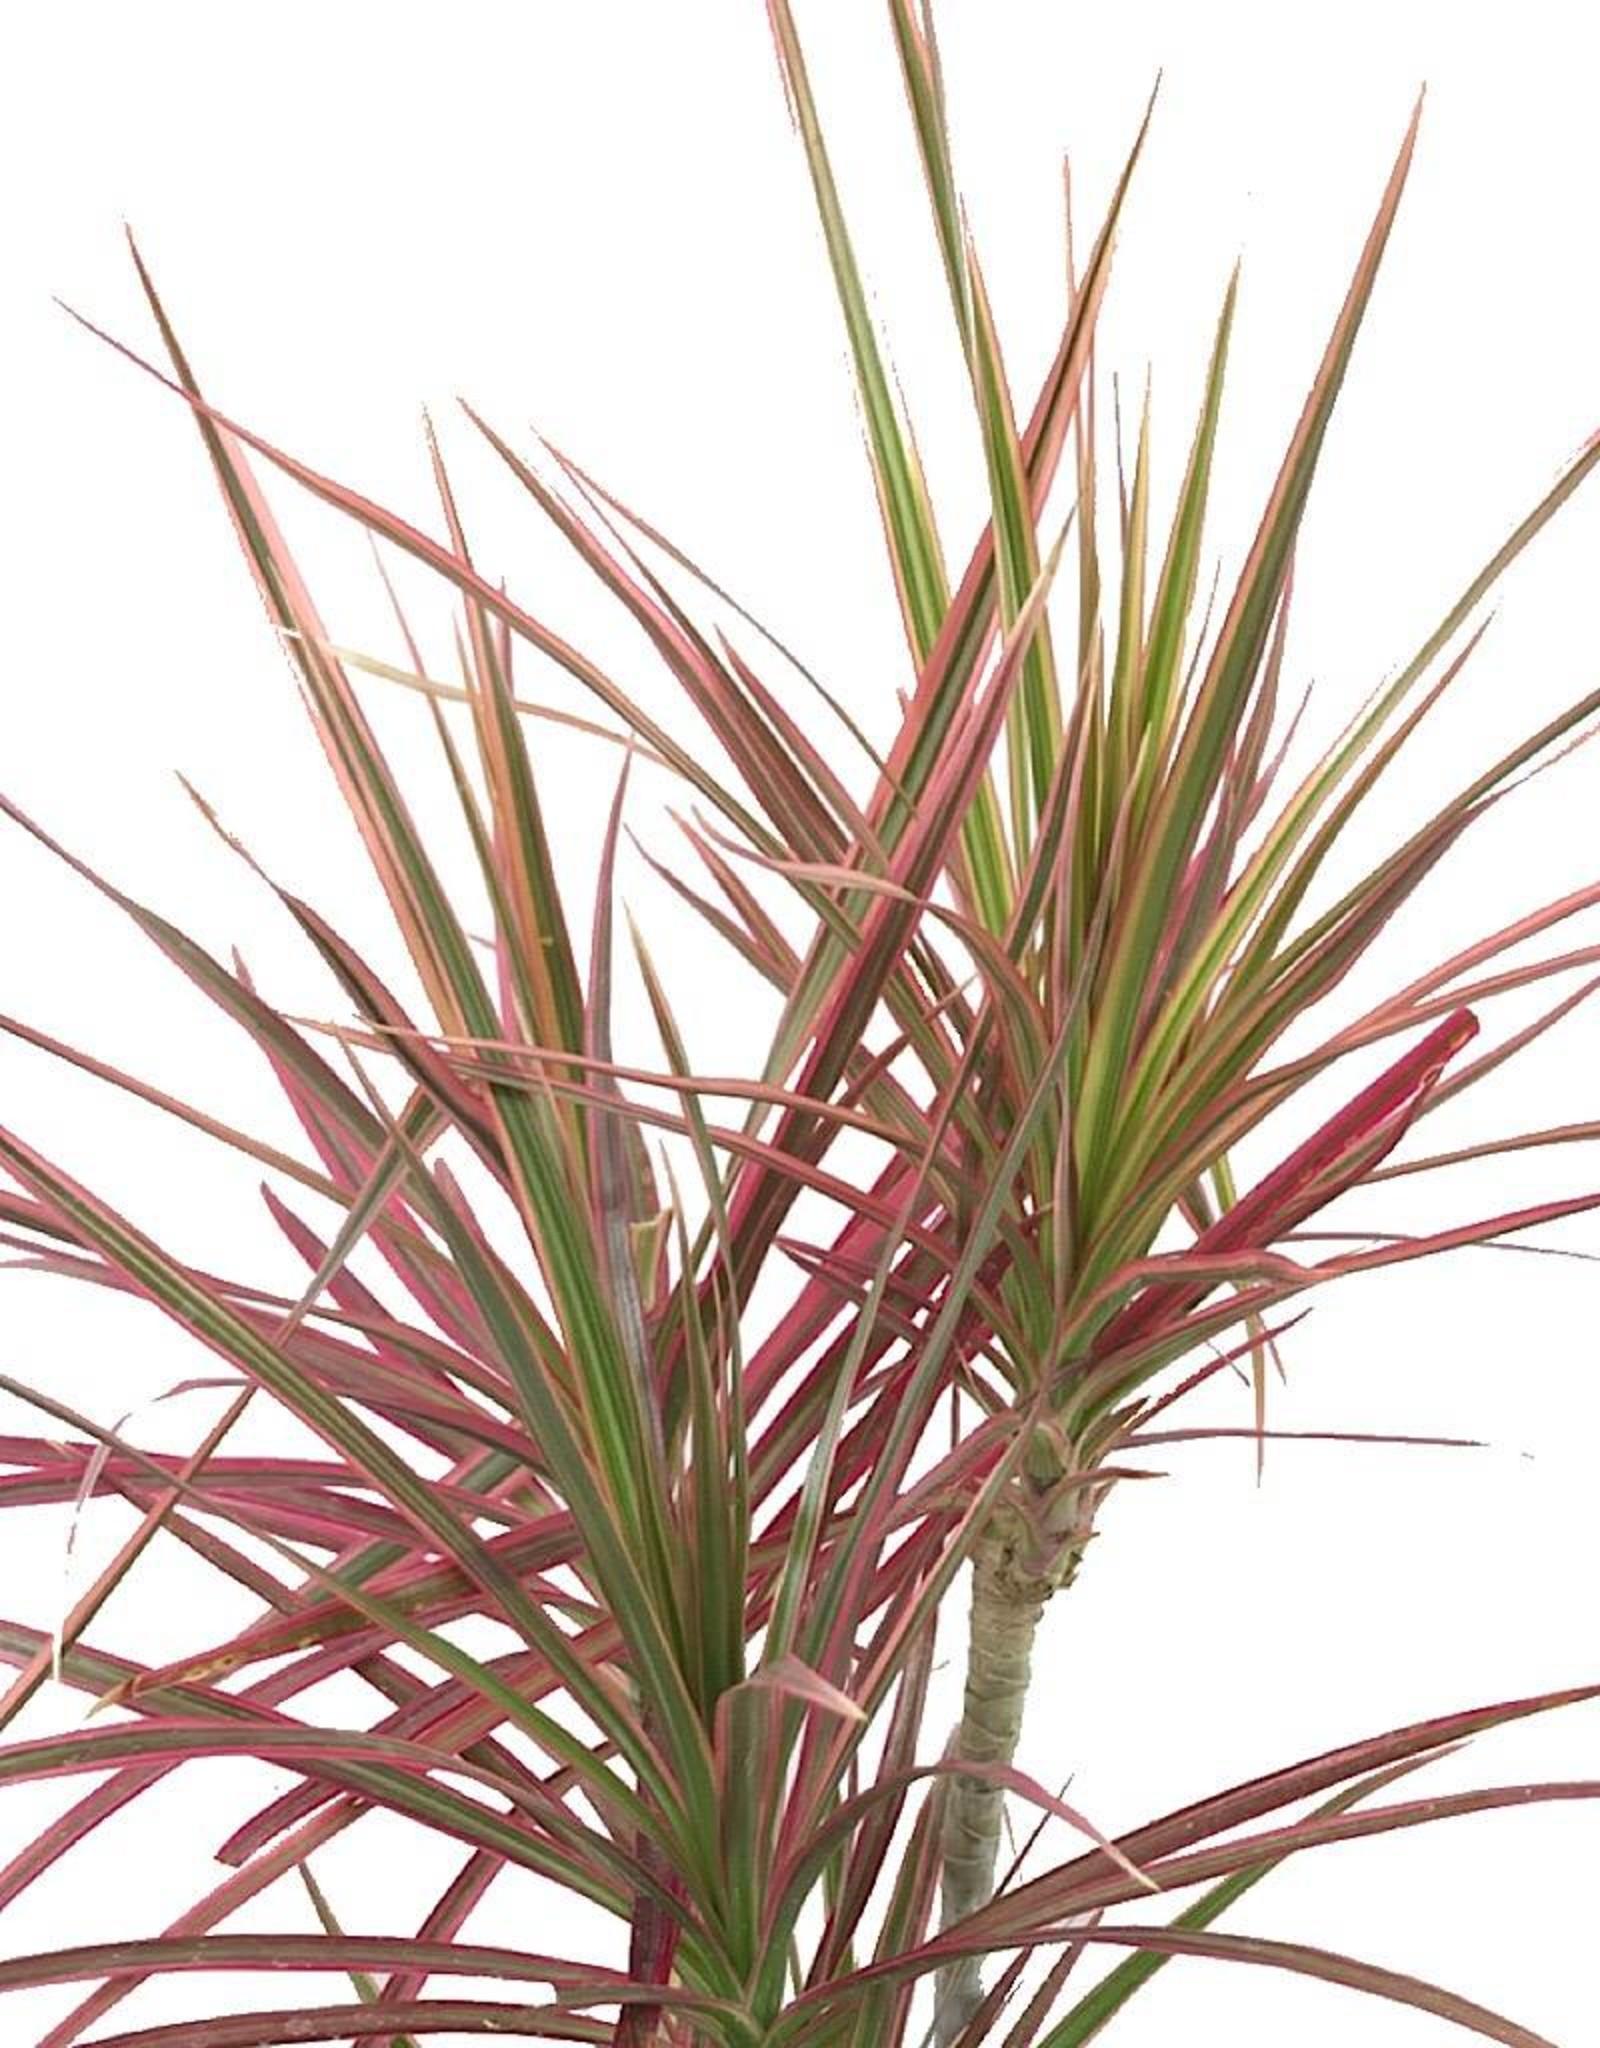 Dracaena marginata 'Colorama' 6 inch